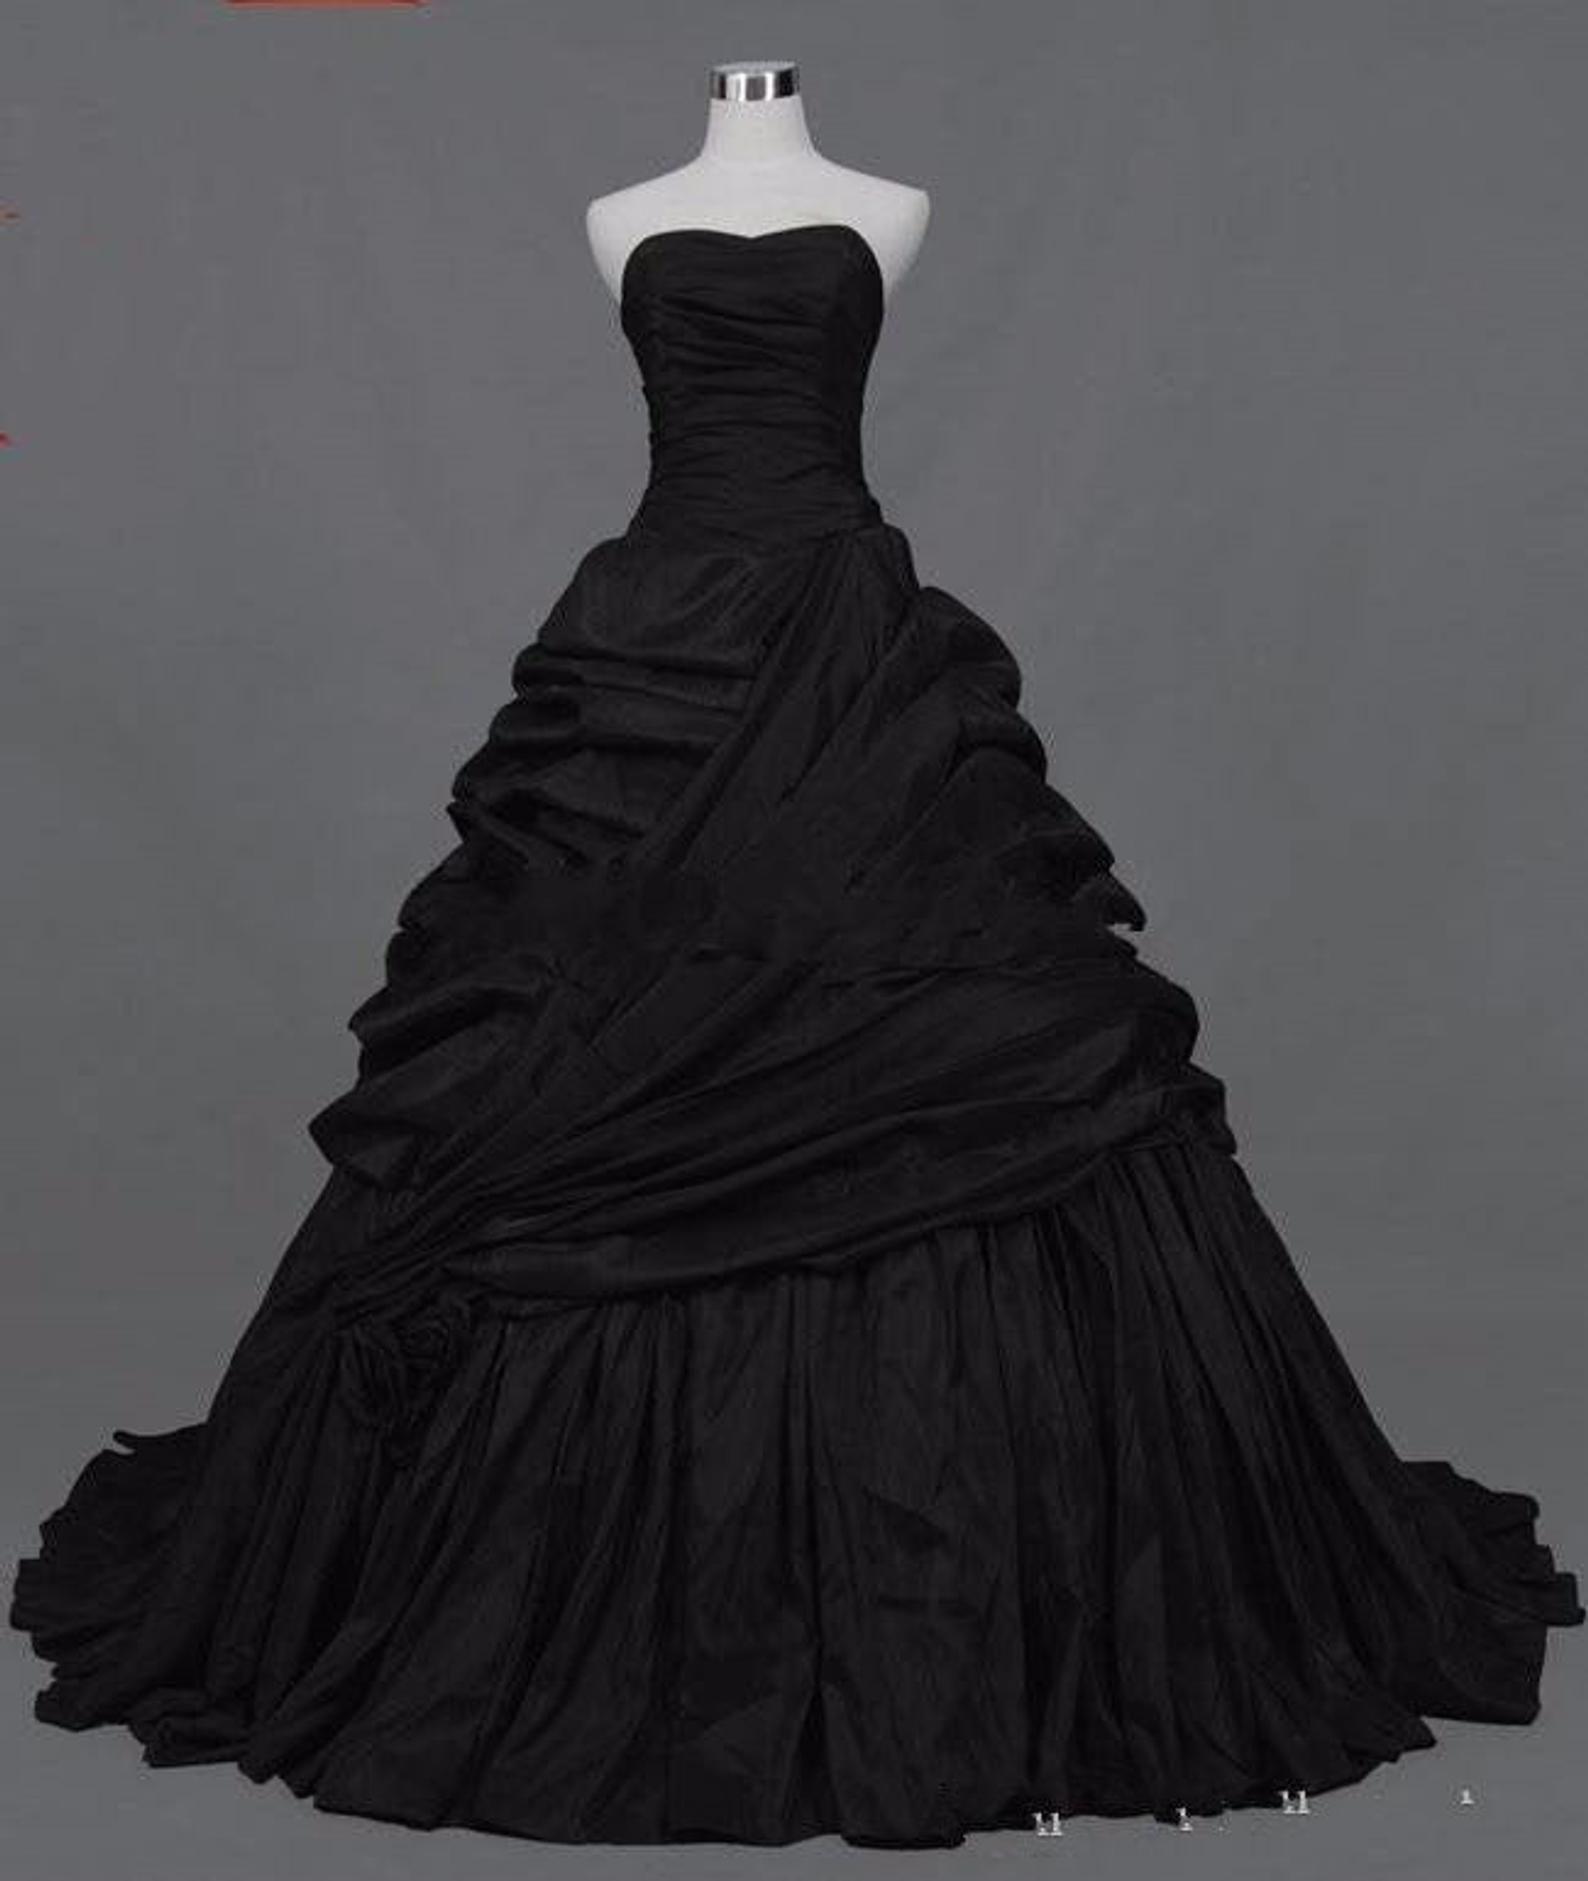 Gothic Victorian Black Wedding Dresses Sweetheart Corset Back Taffeta Bridal Gowns Black Wedding Dress Gothic Black Wedding Gowns Gothic Wedding Dress [ 1881 x 1588 Pixel ]